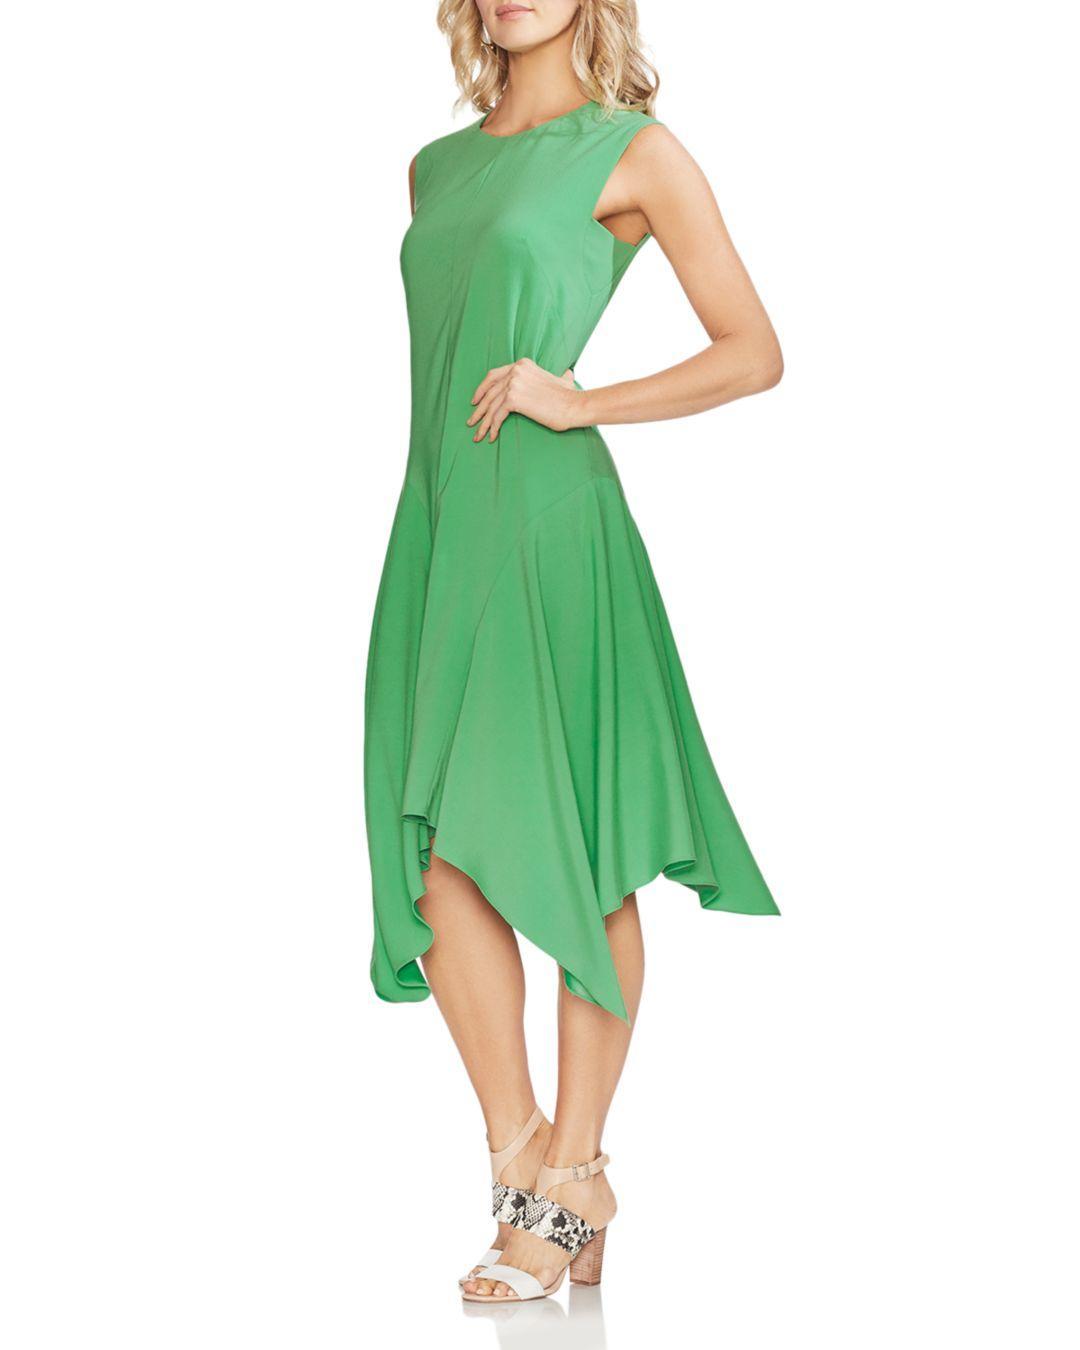 Vince Camuto Satin Handkerchief Midi Dress In Green Lyst